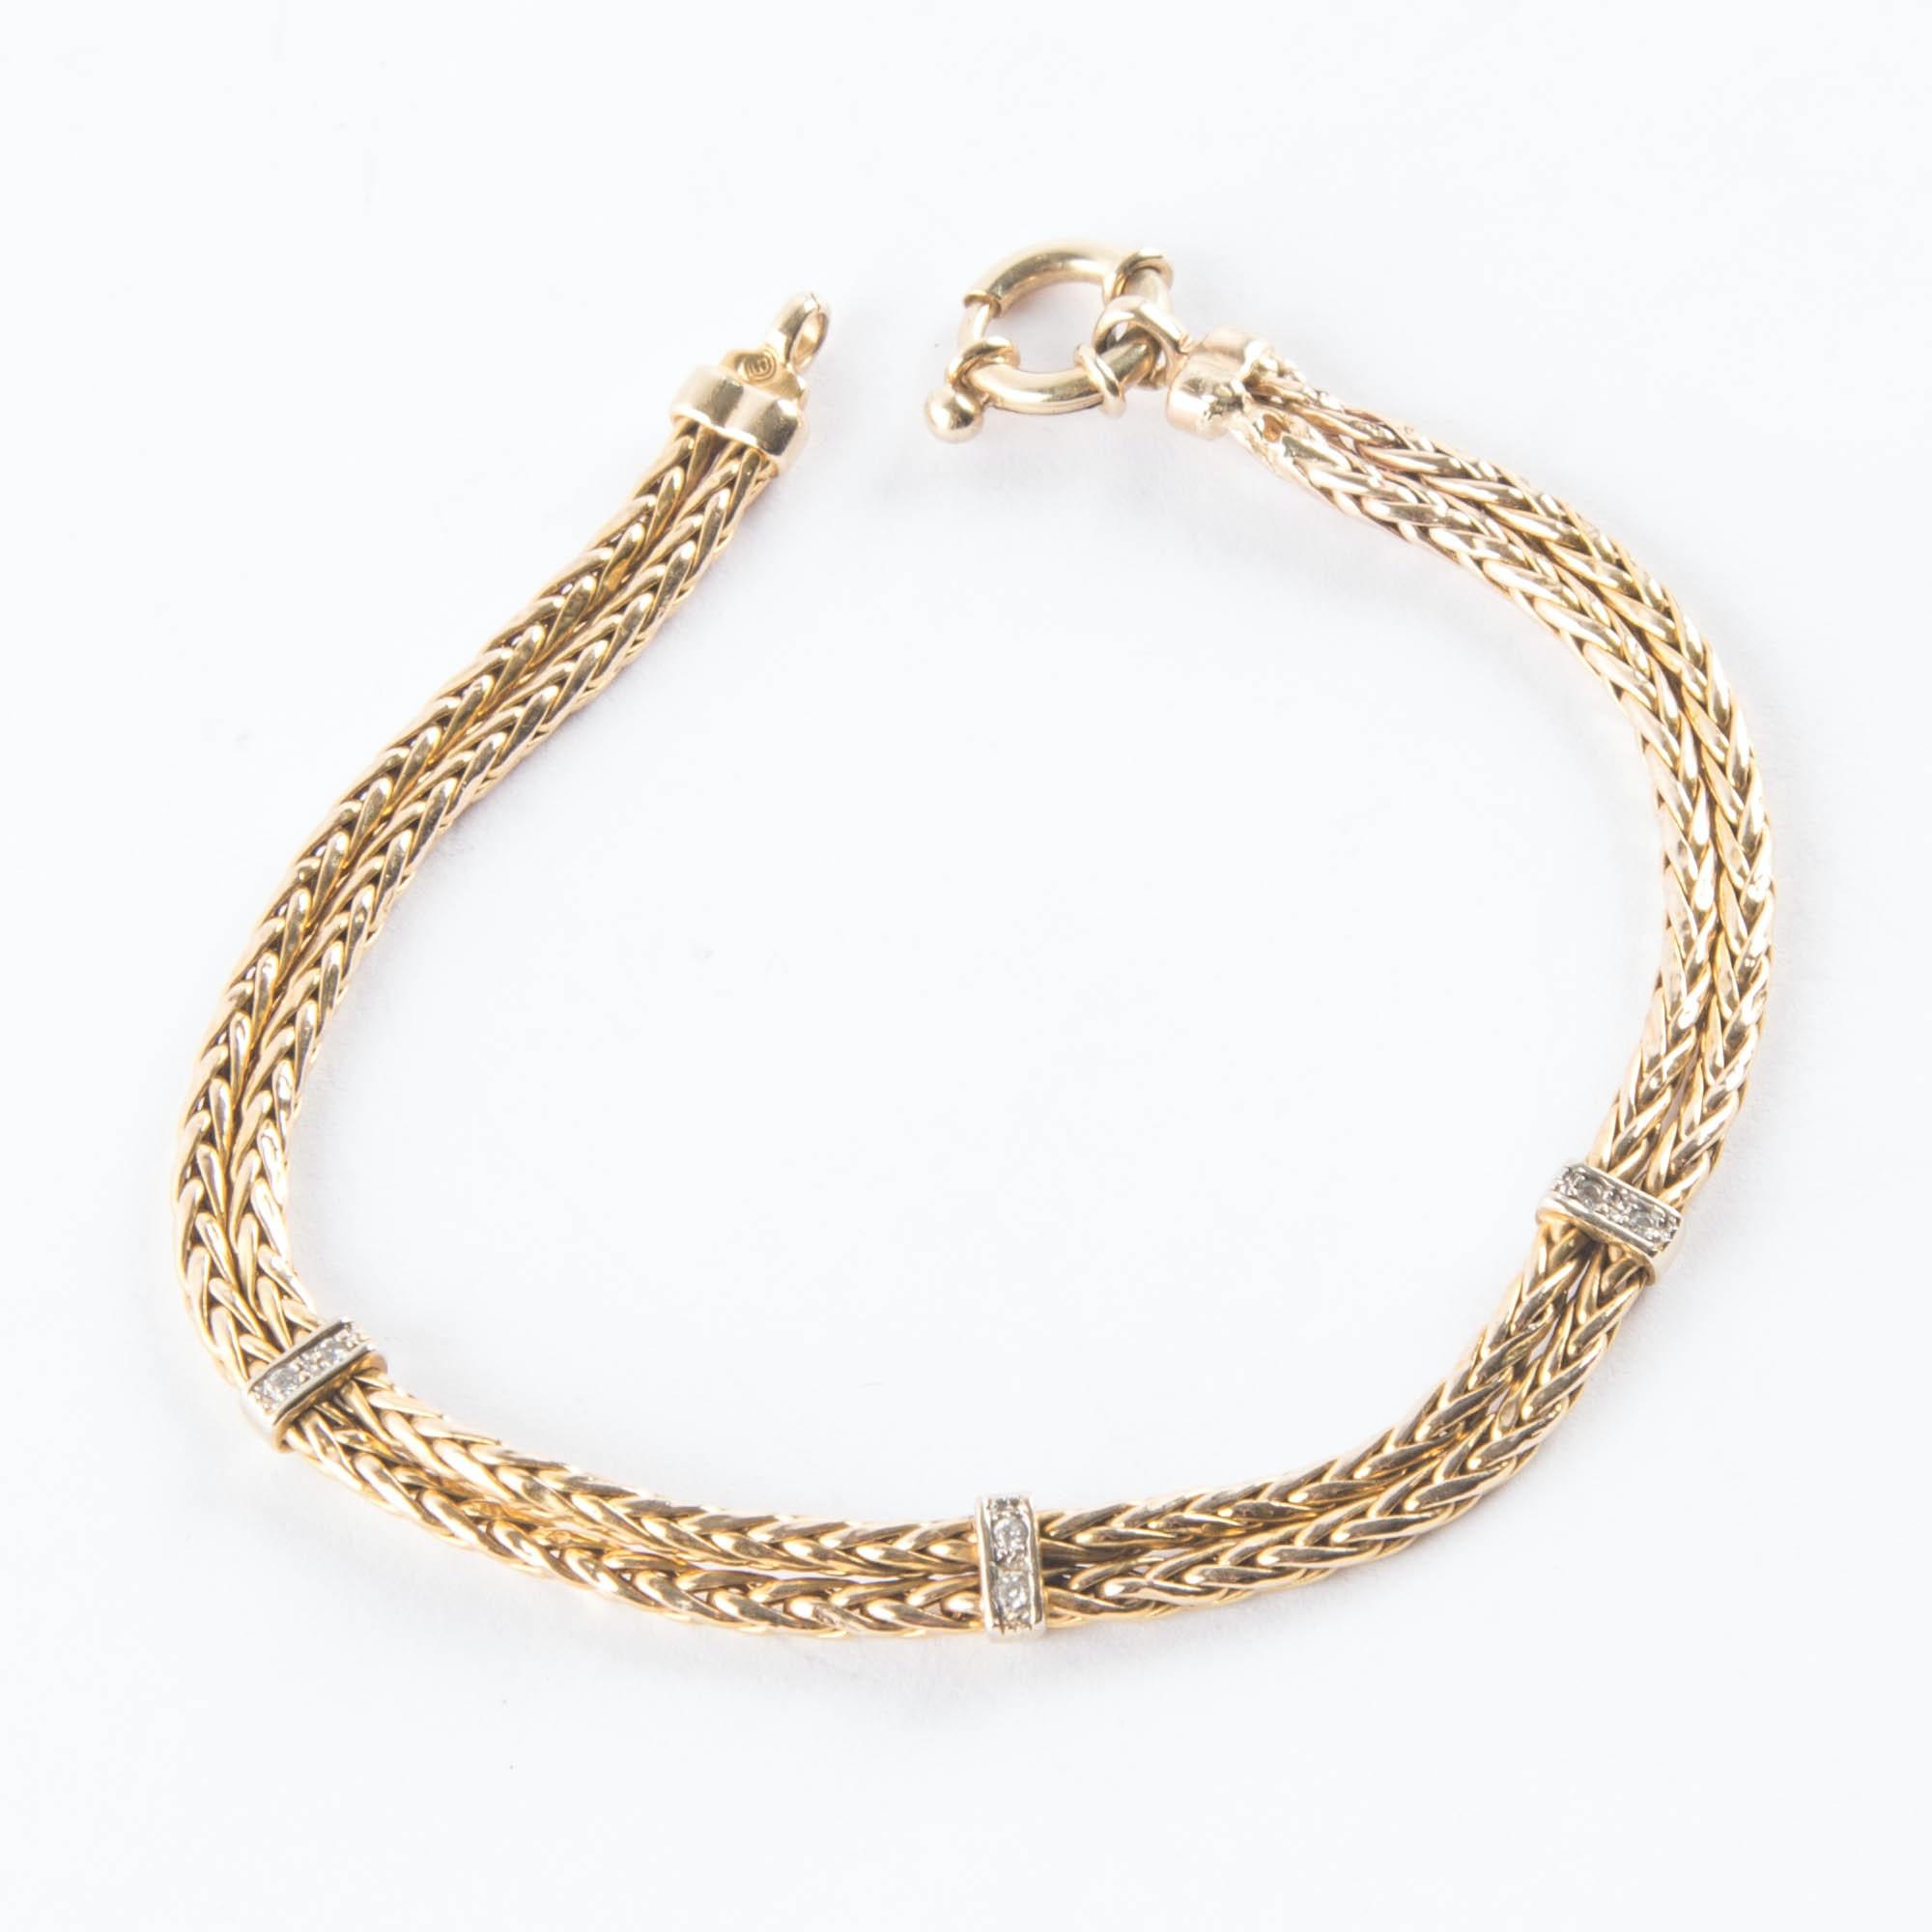 14K Gold Double Foxtail Bracelet